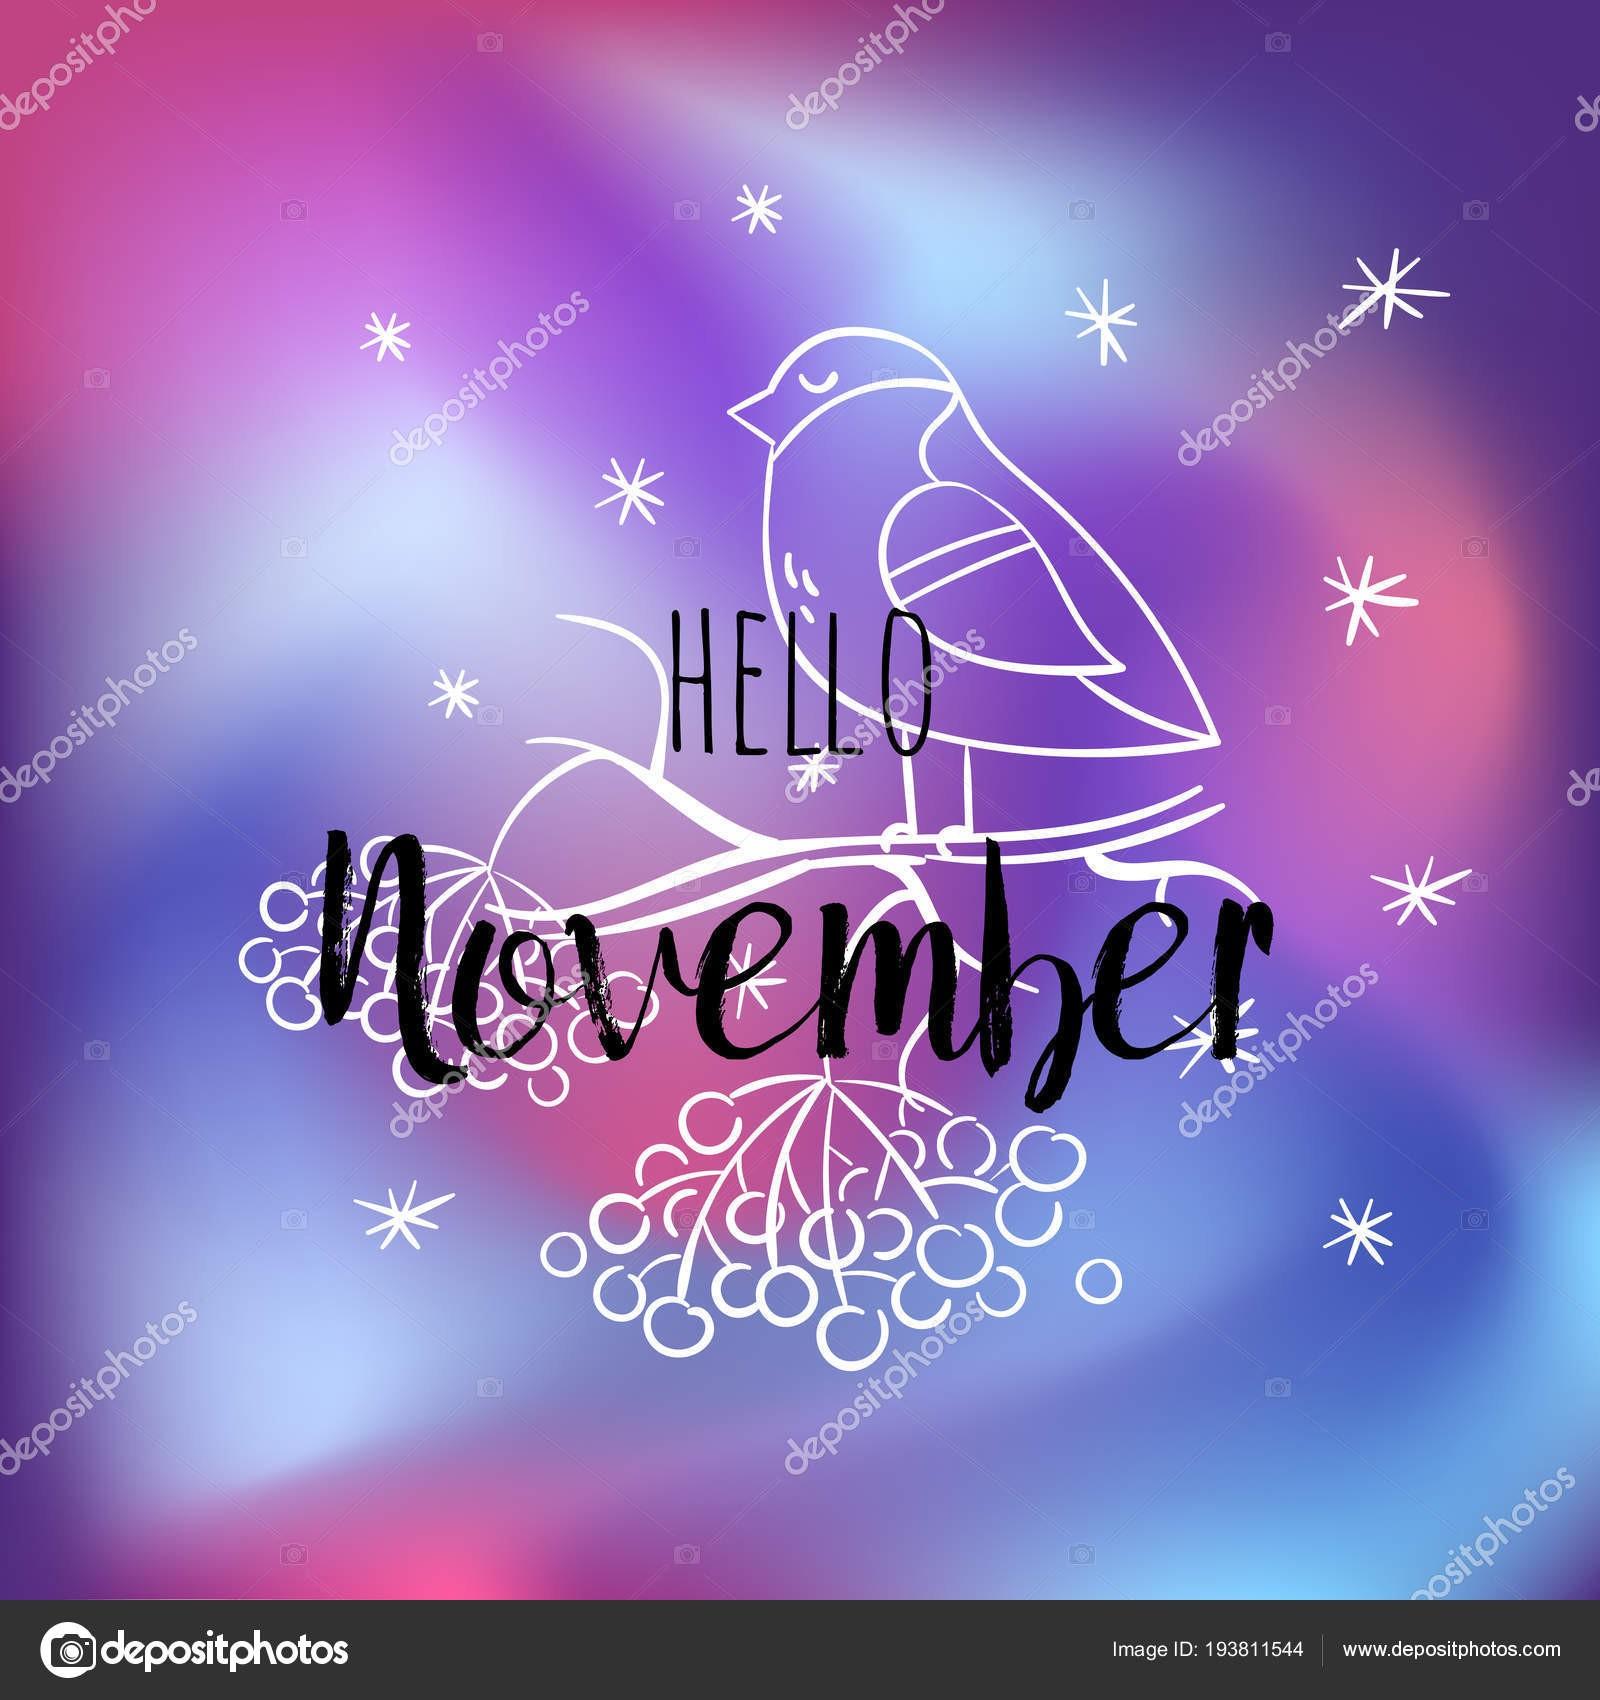 Calendário 2019 Para Imprimir Com Foto Más Actual Calendario Novembro 2018 Imprimir T